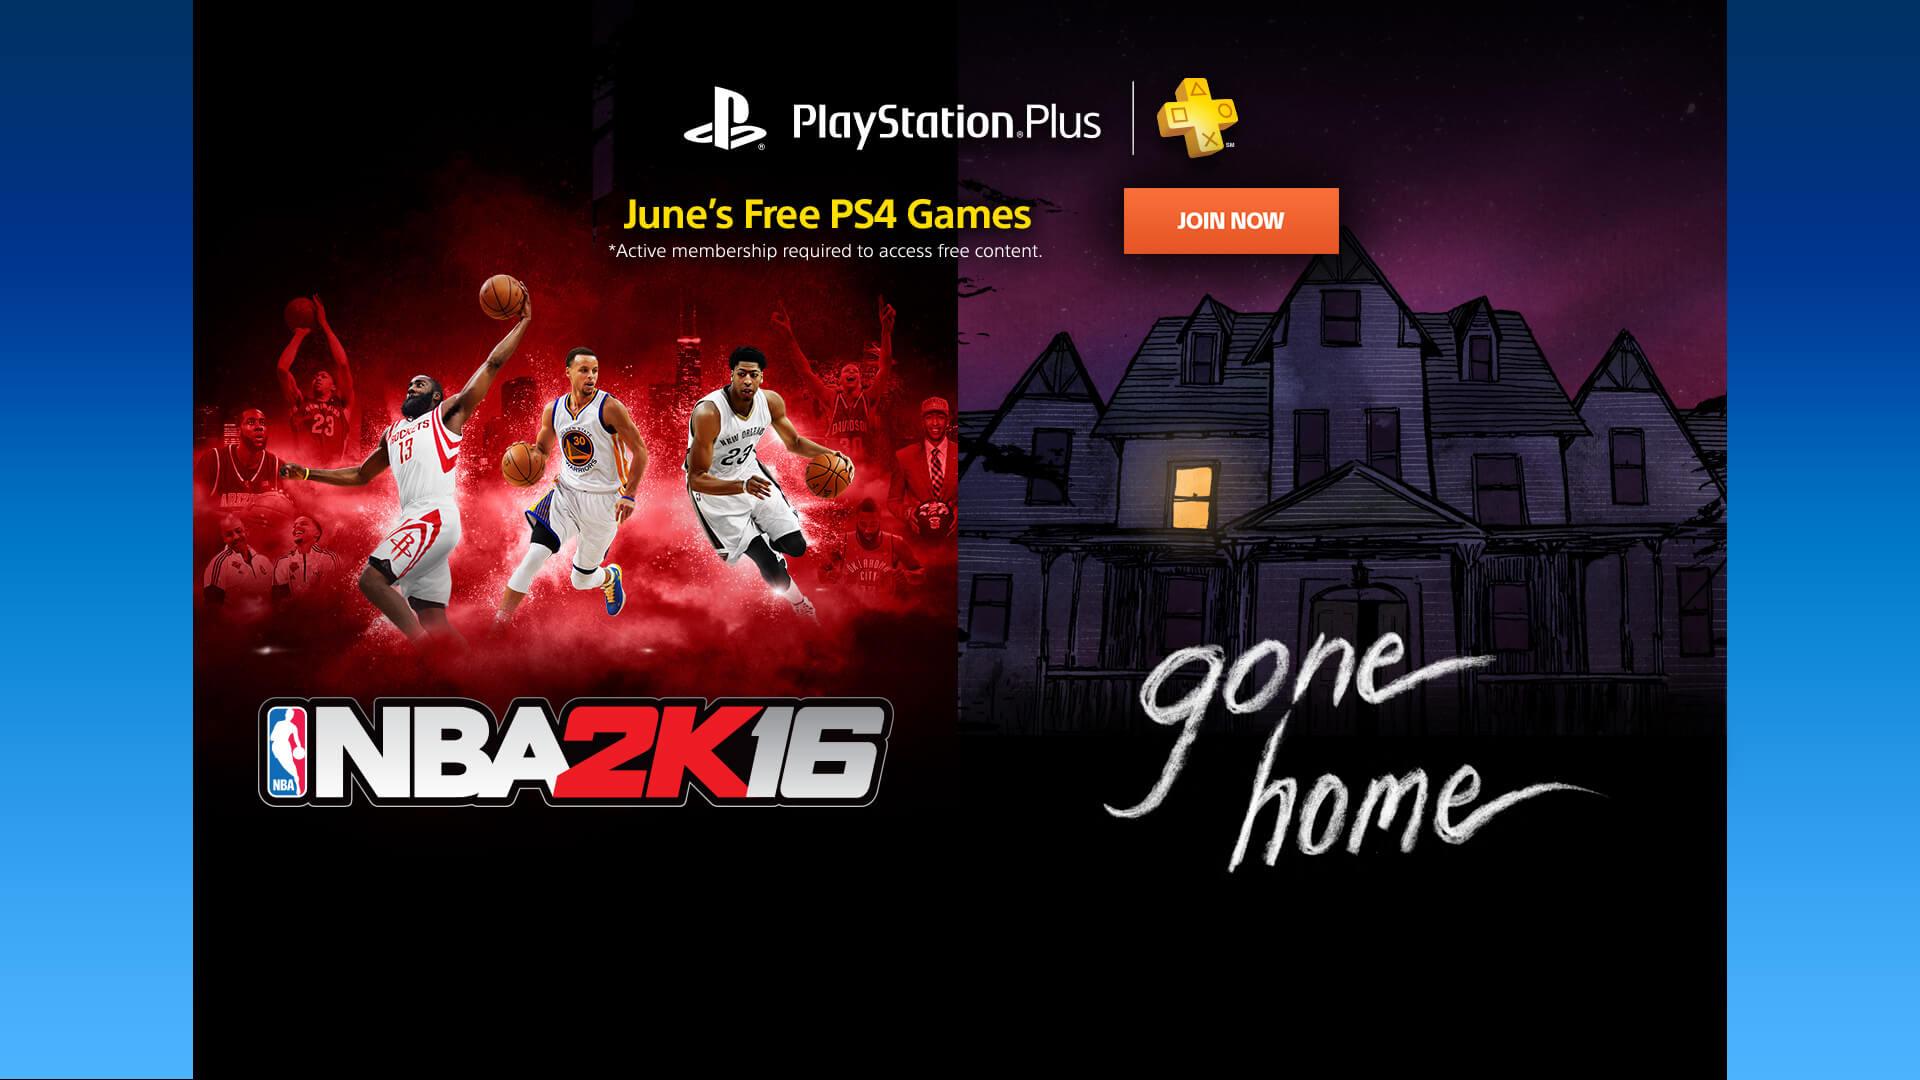 Playstation Plus junio 2016